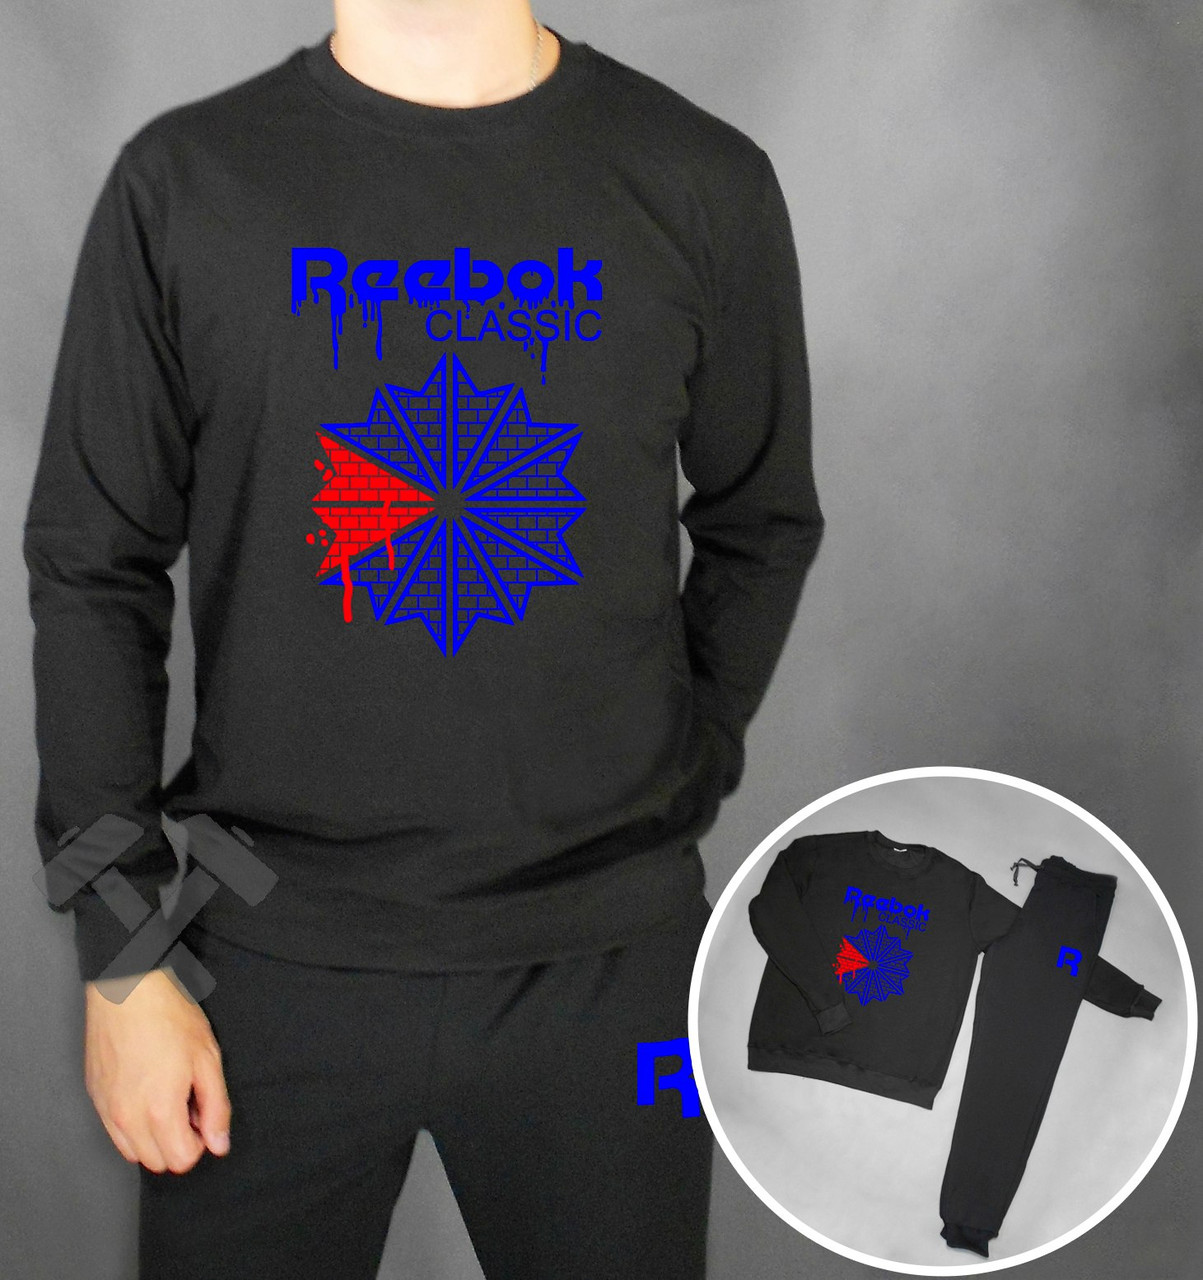 Спортивный костюм Reebok черного цвета с синим логотипом на груди, фото 1